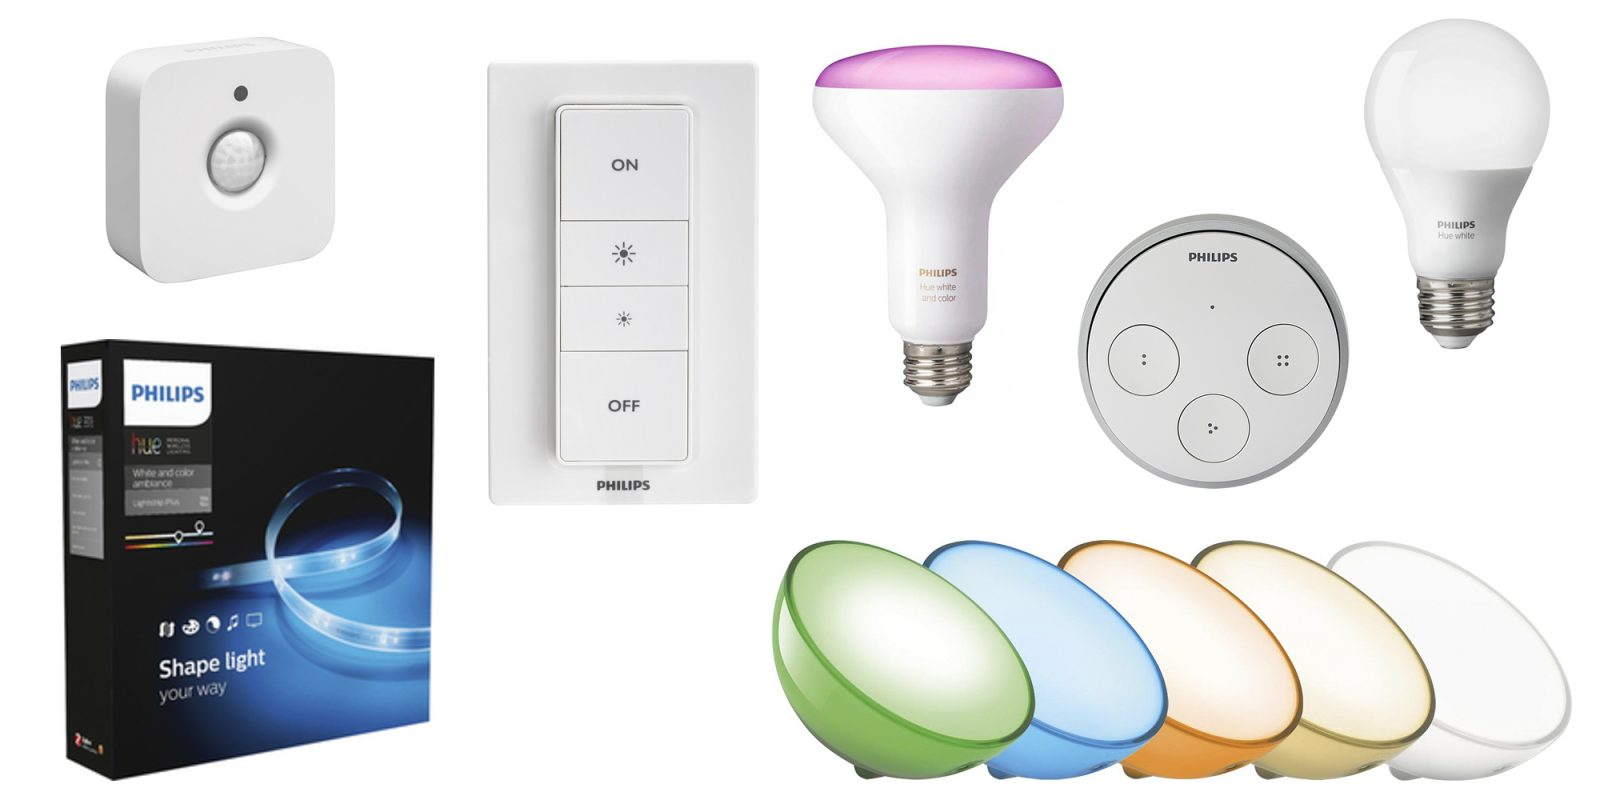 Save 20% on Philips Hue Smart Lighting products: 4-Bulb